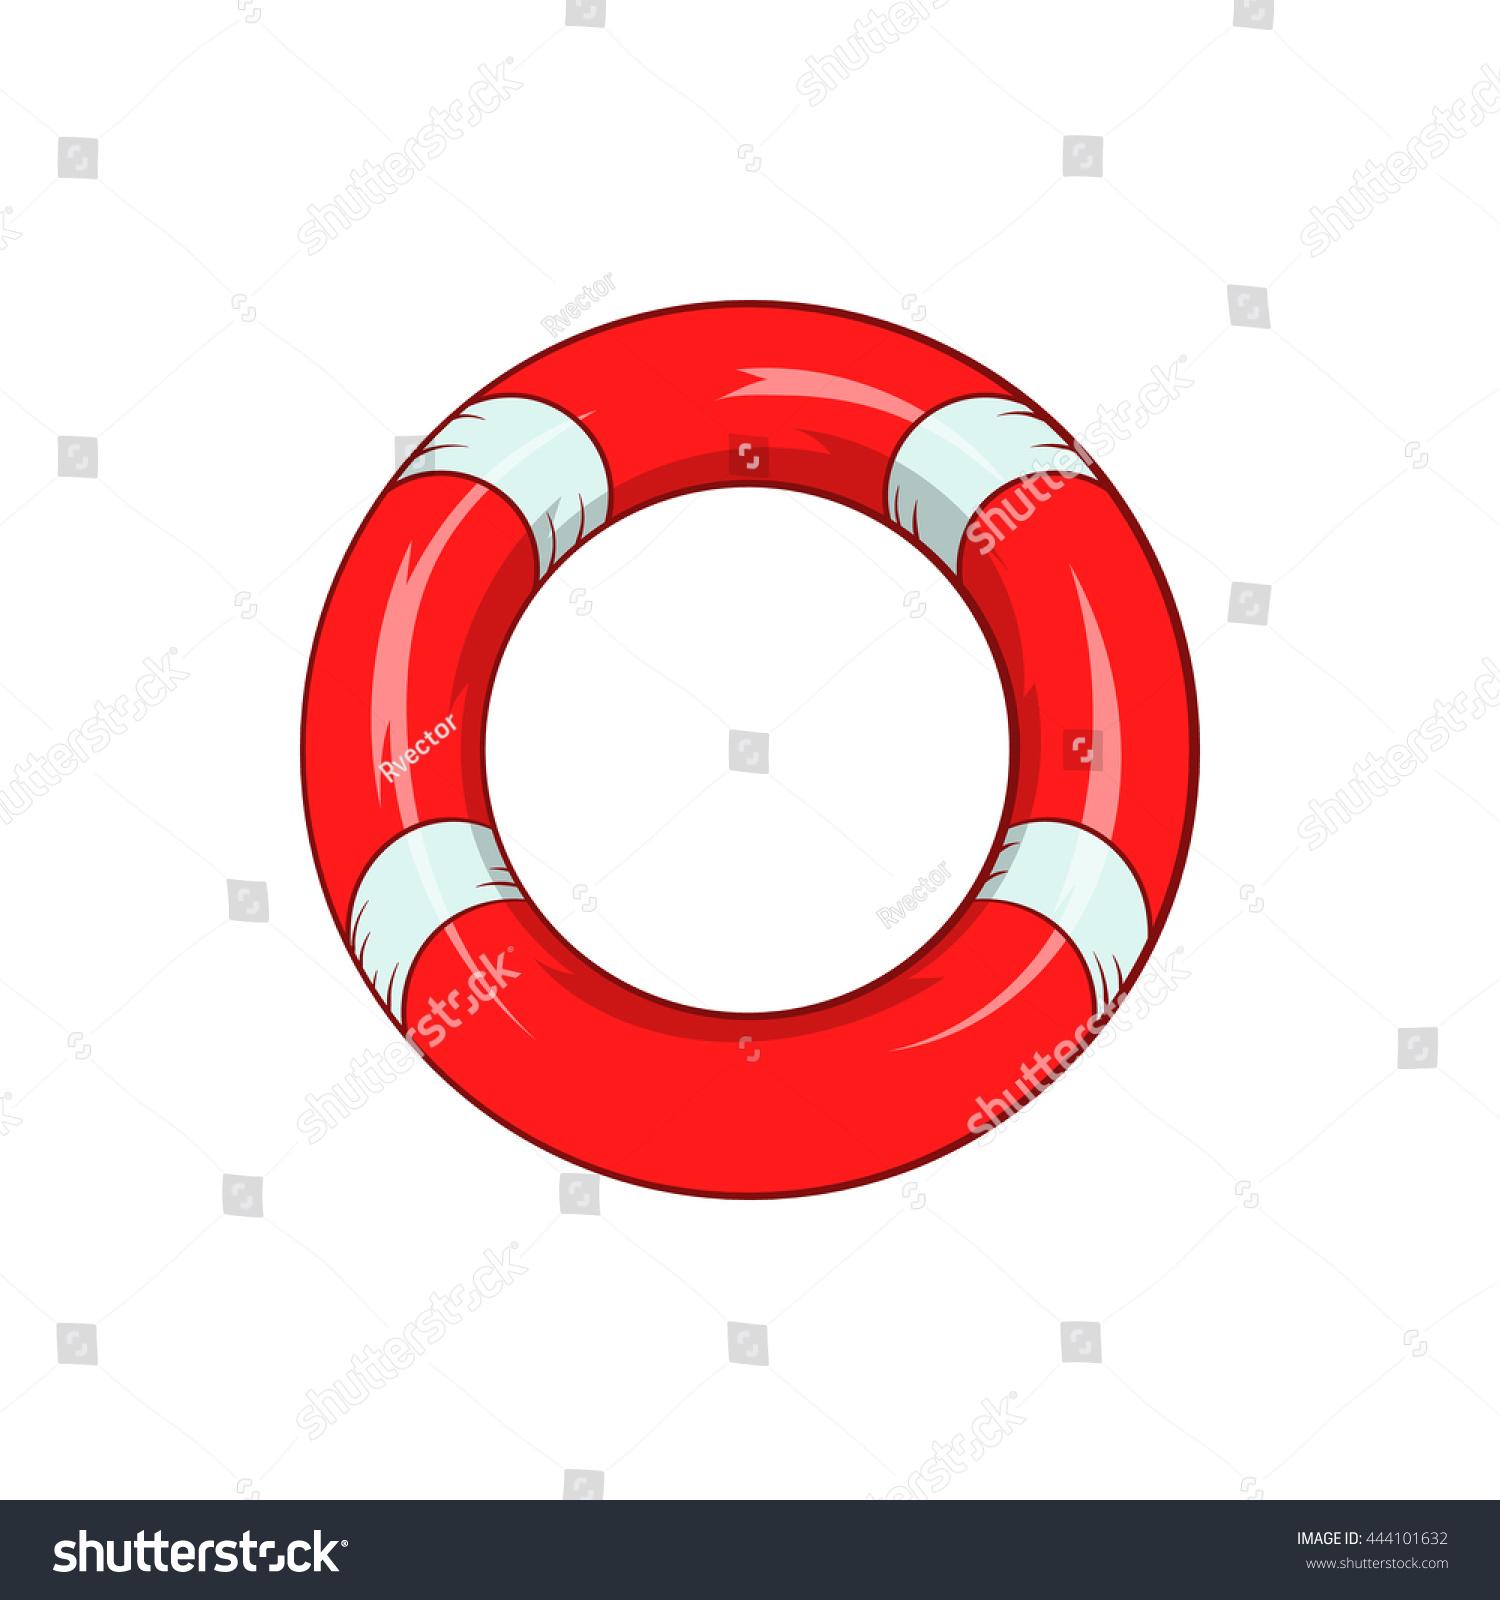 Lifeline Icon In Cartoon Style Isolated On White Background